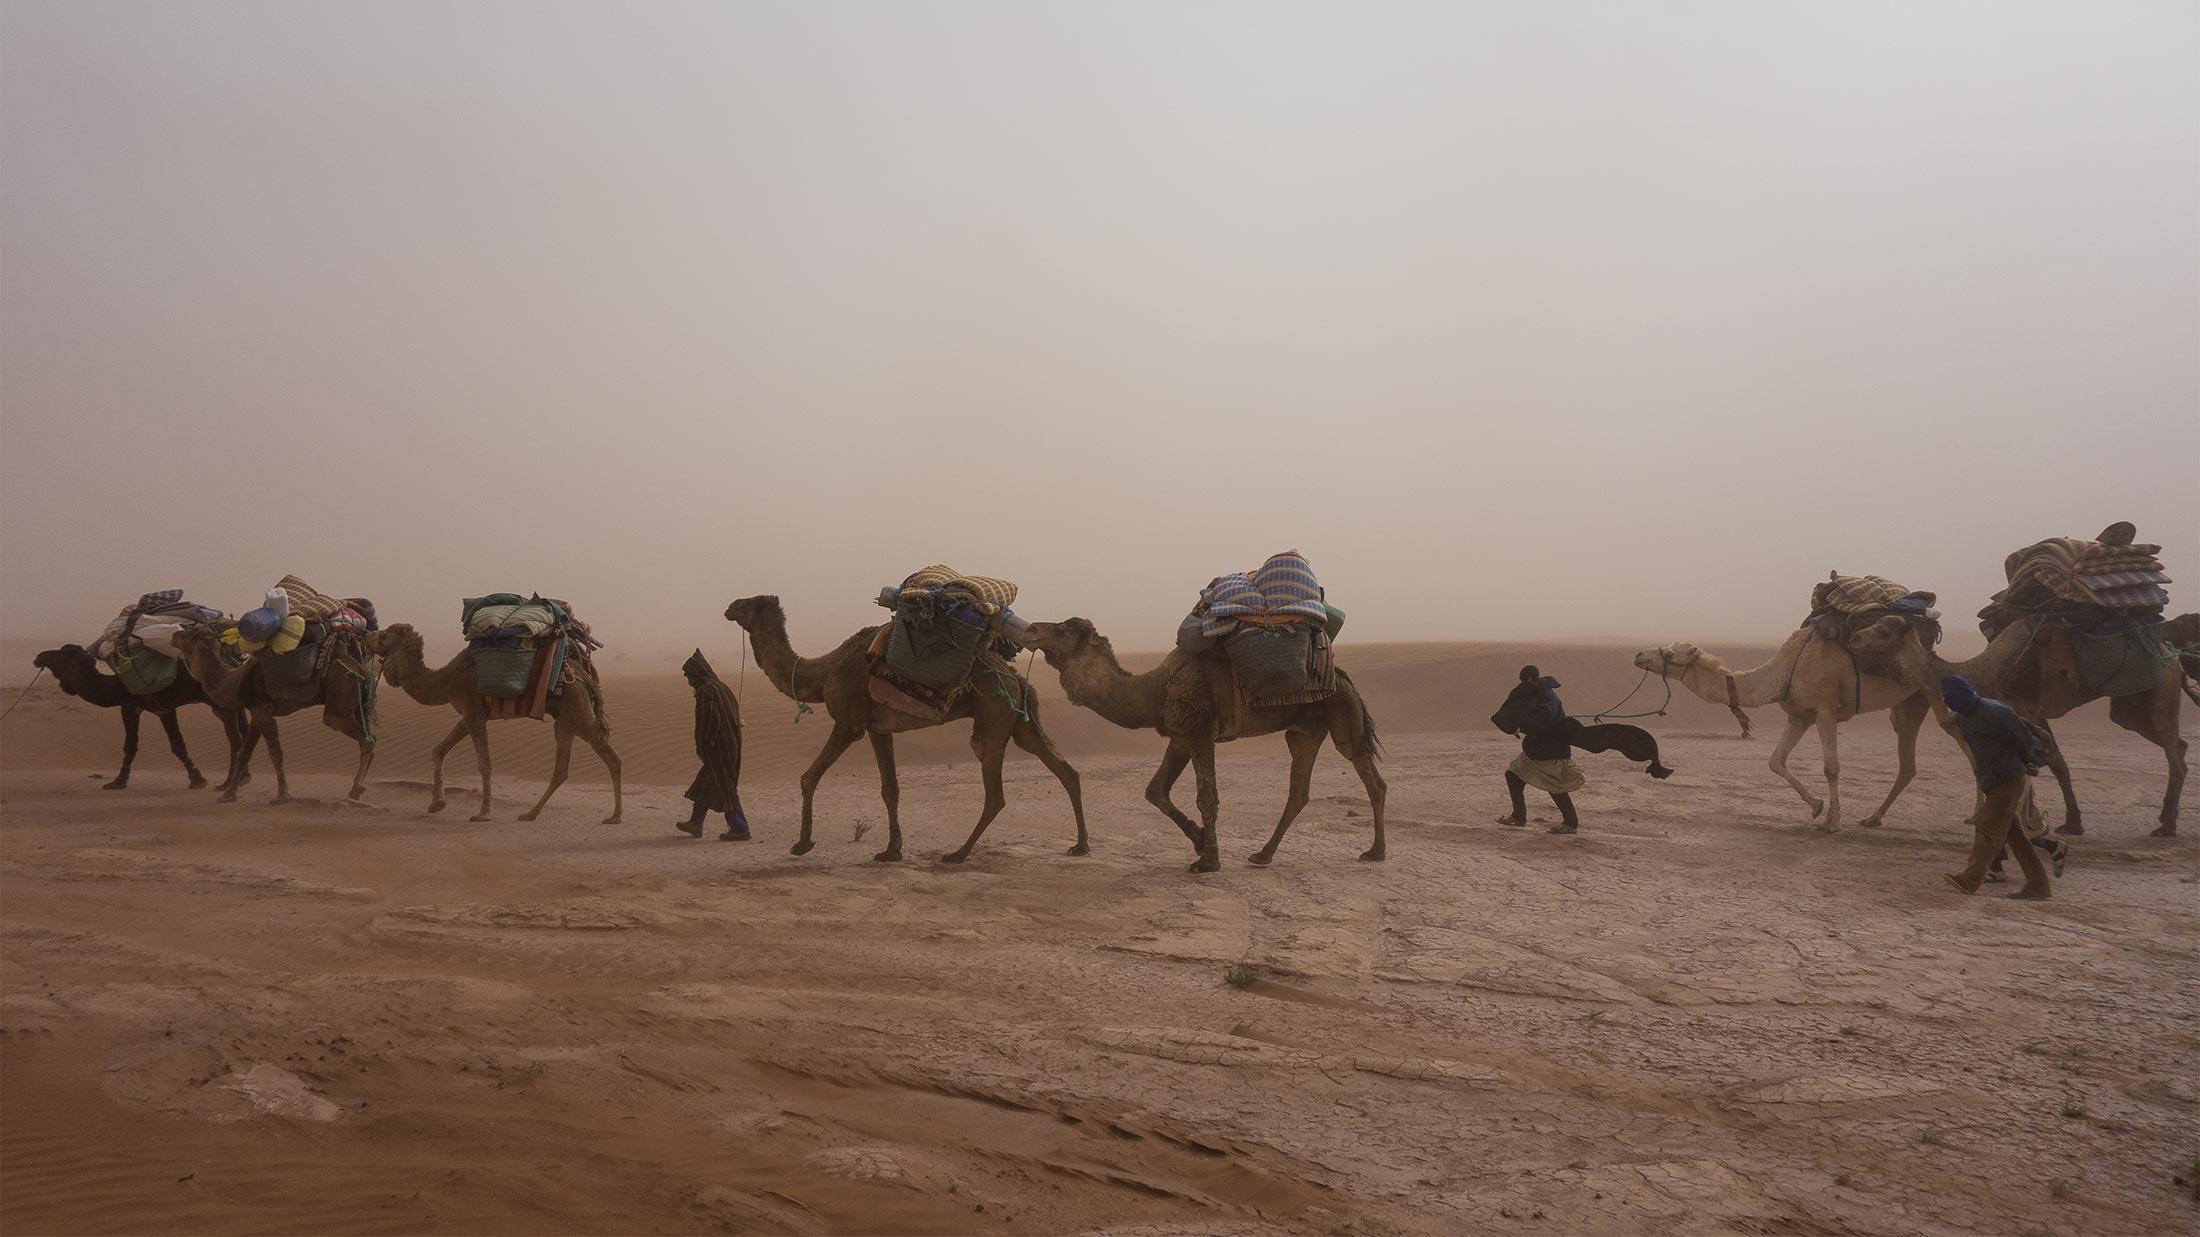 Harald Schaffer Thumbnail: Reportage Marokko, Kamele in einer Reihe